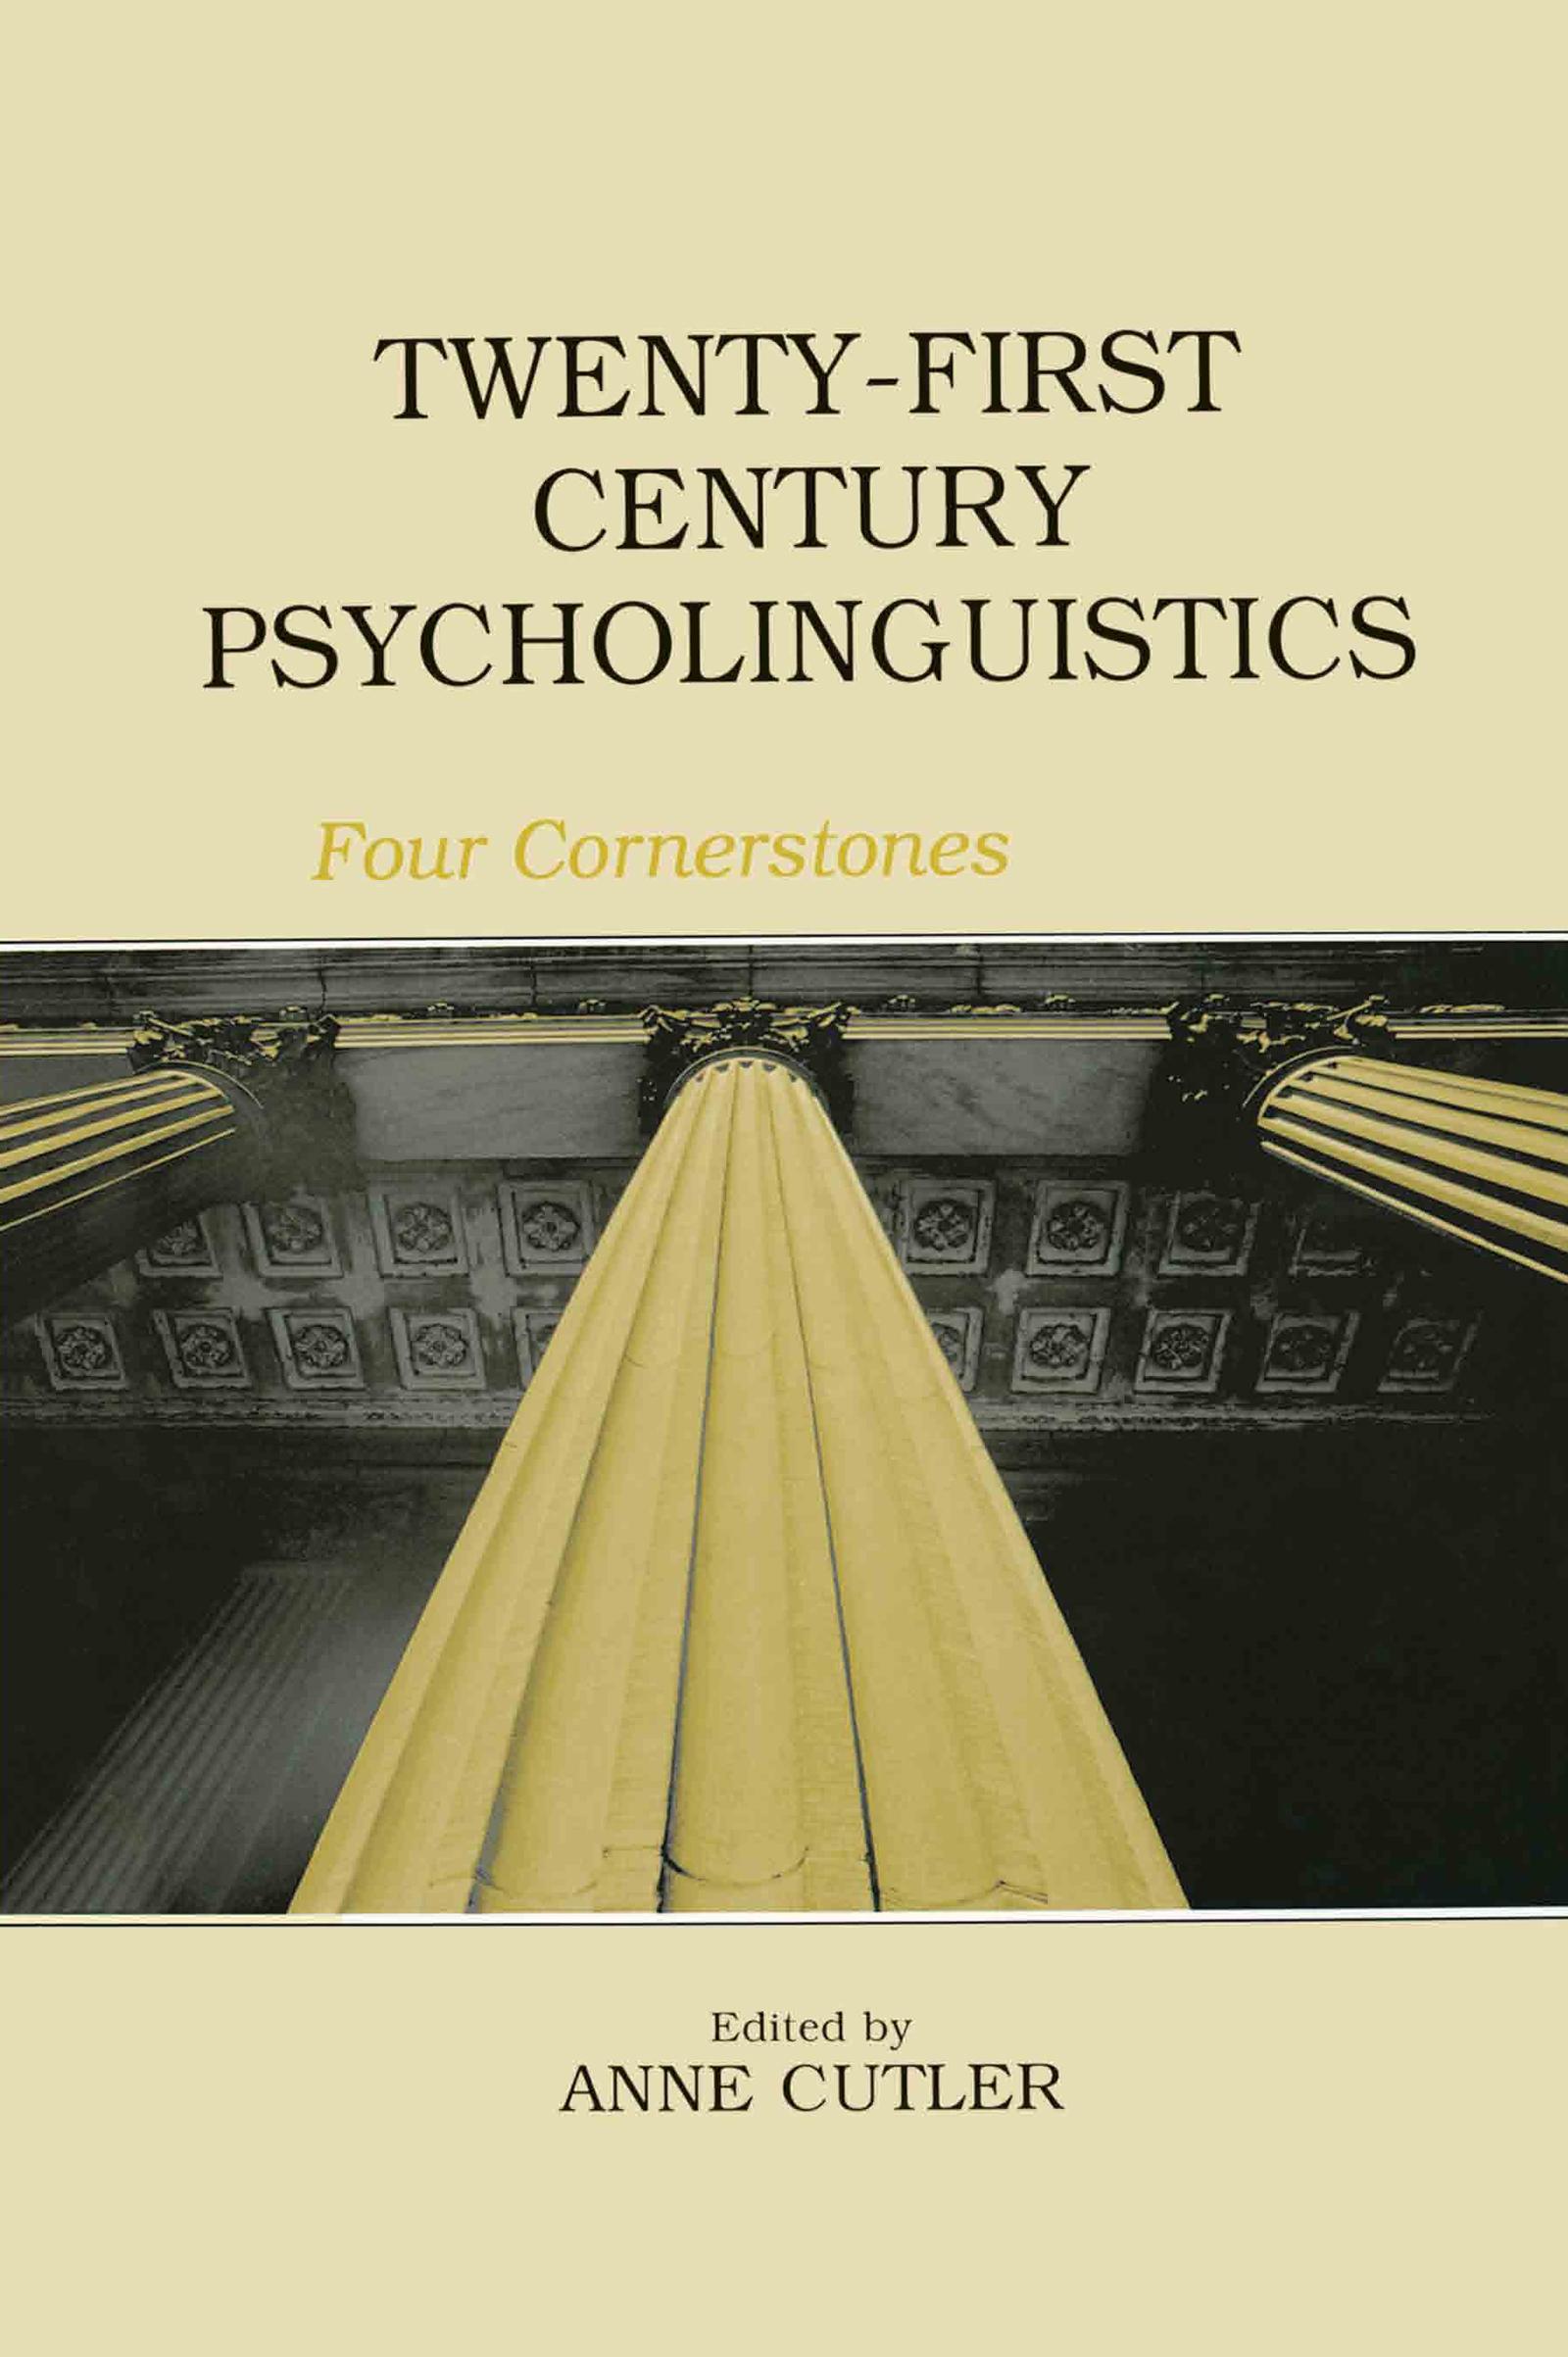 Twenty-First Century Psycholinguistics